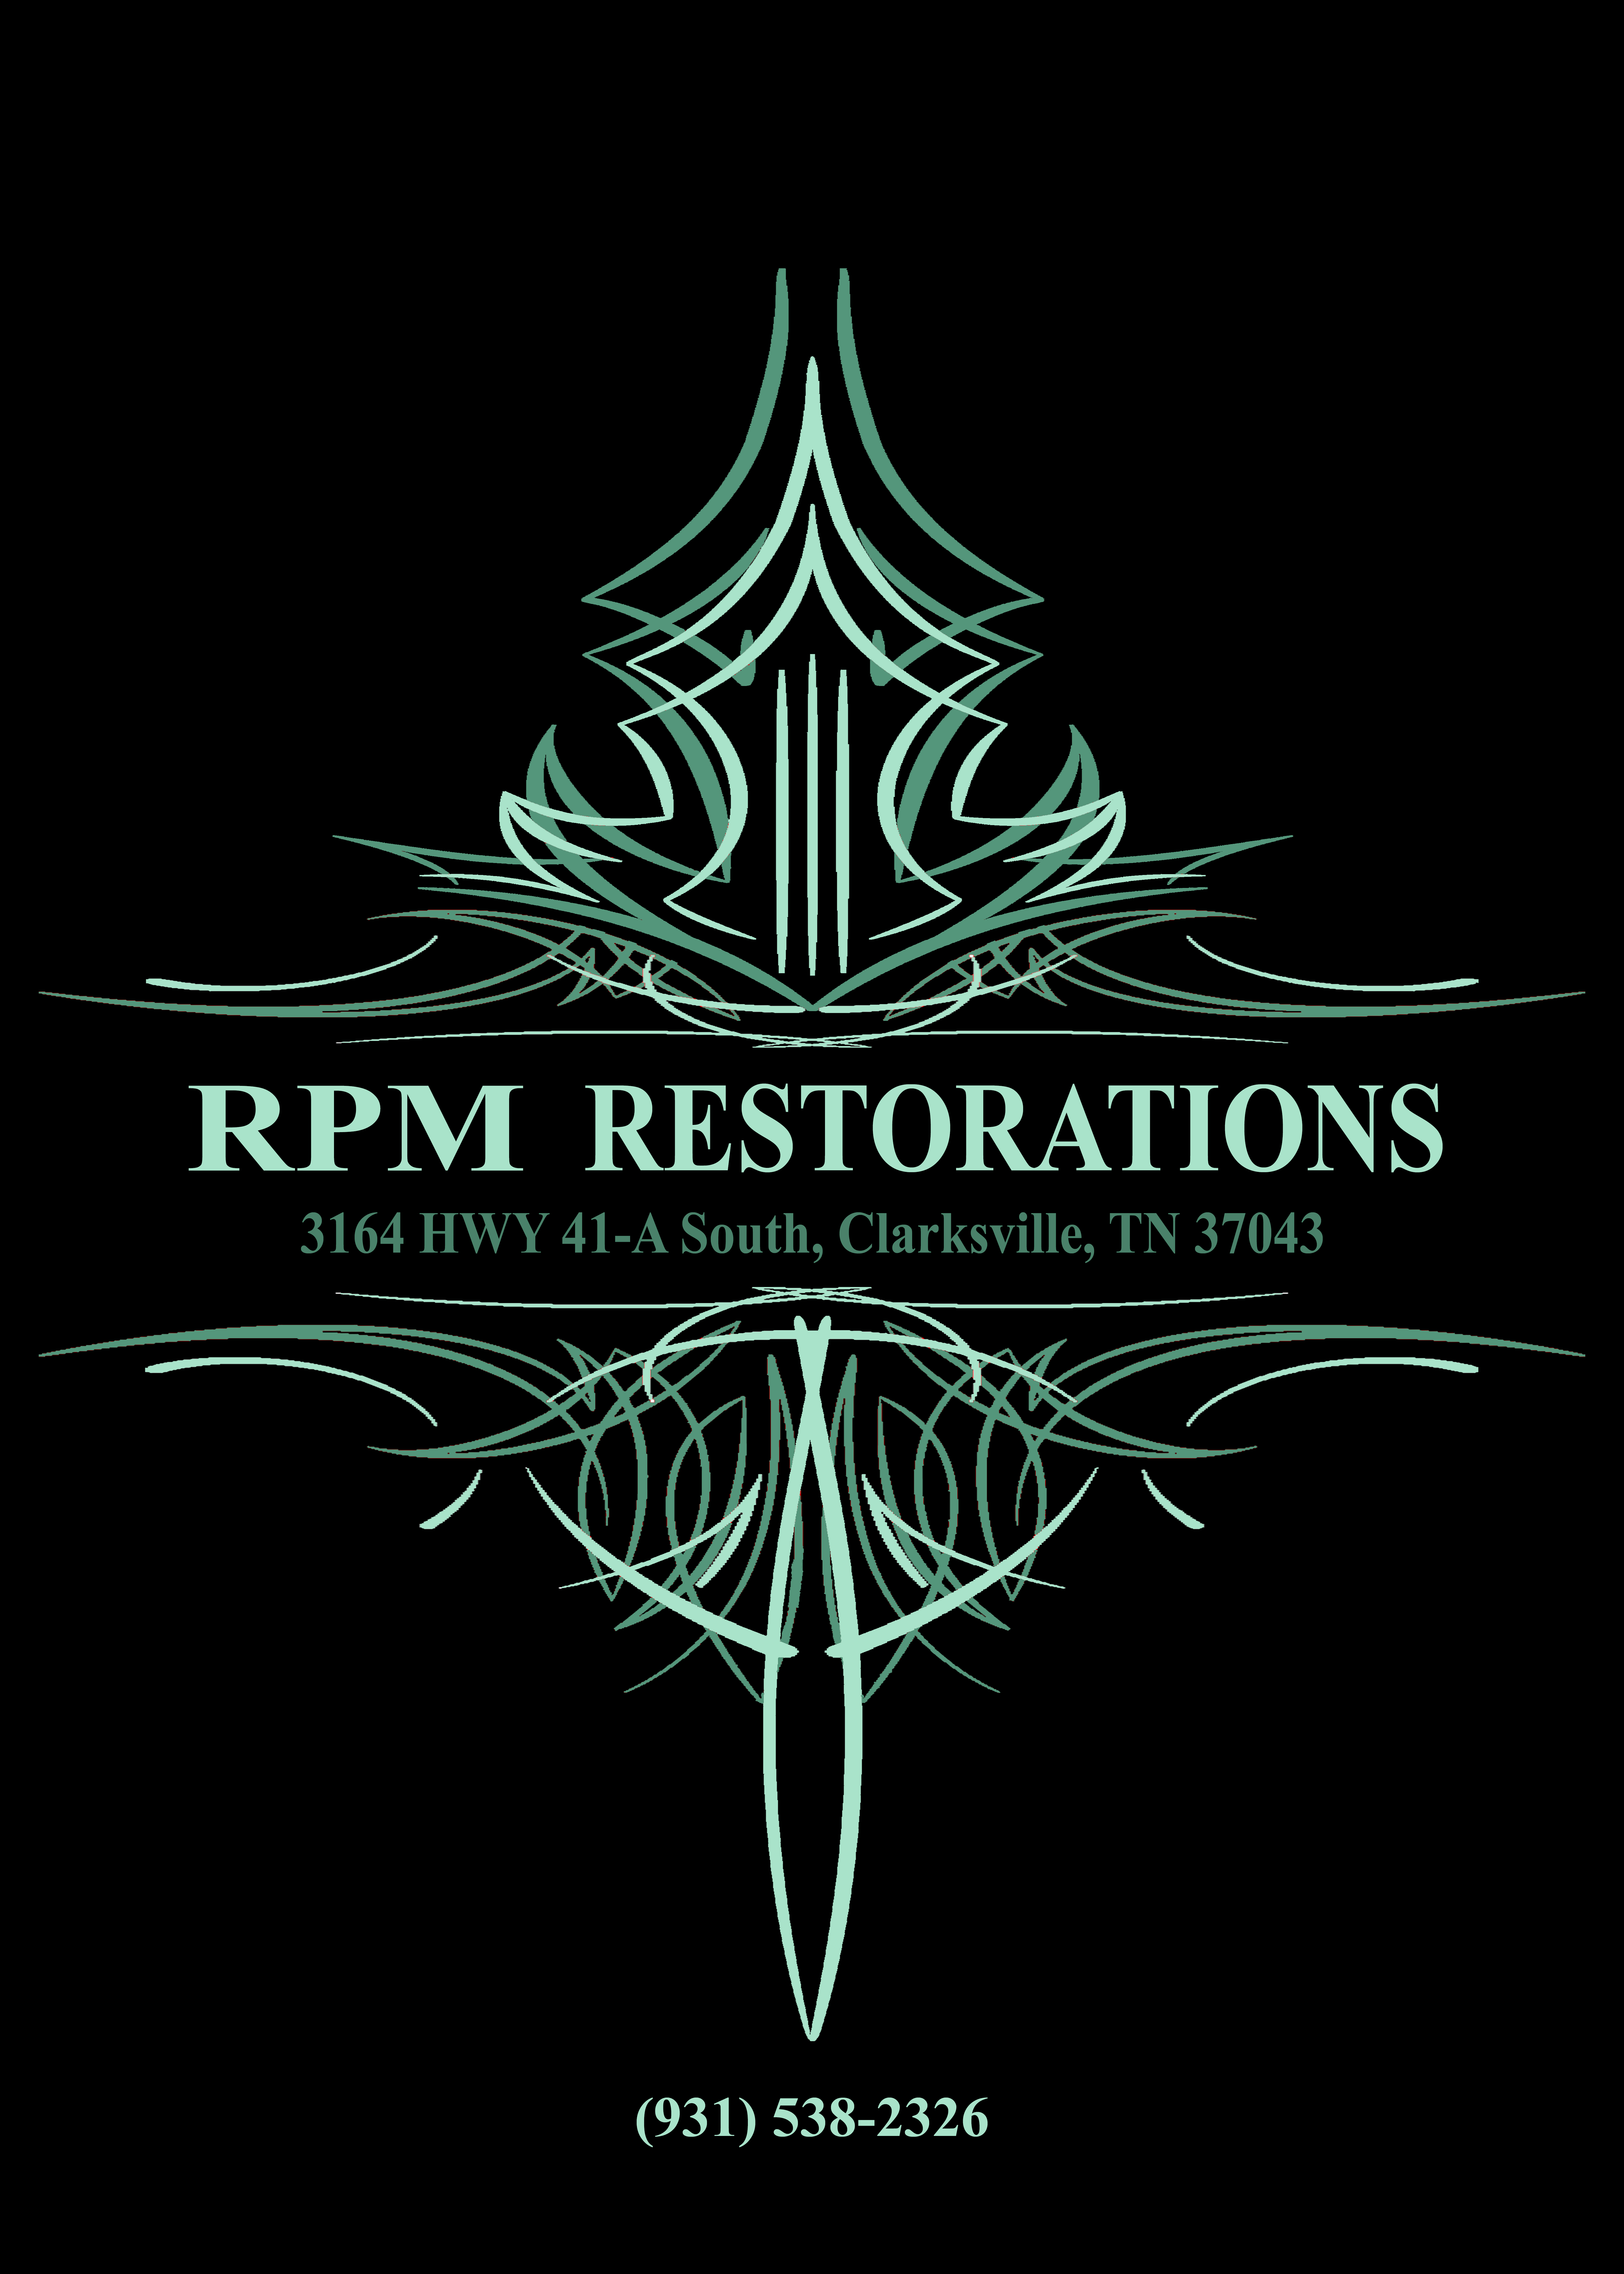 RPM Restoration 2